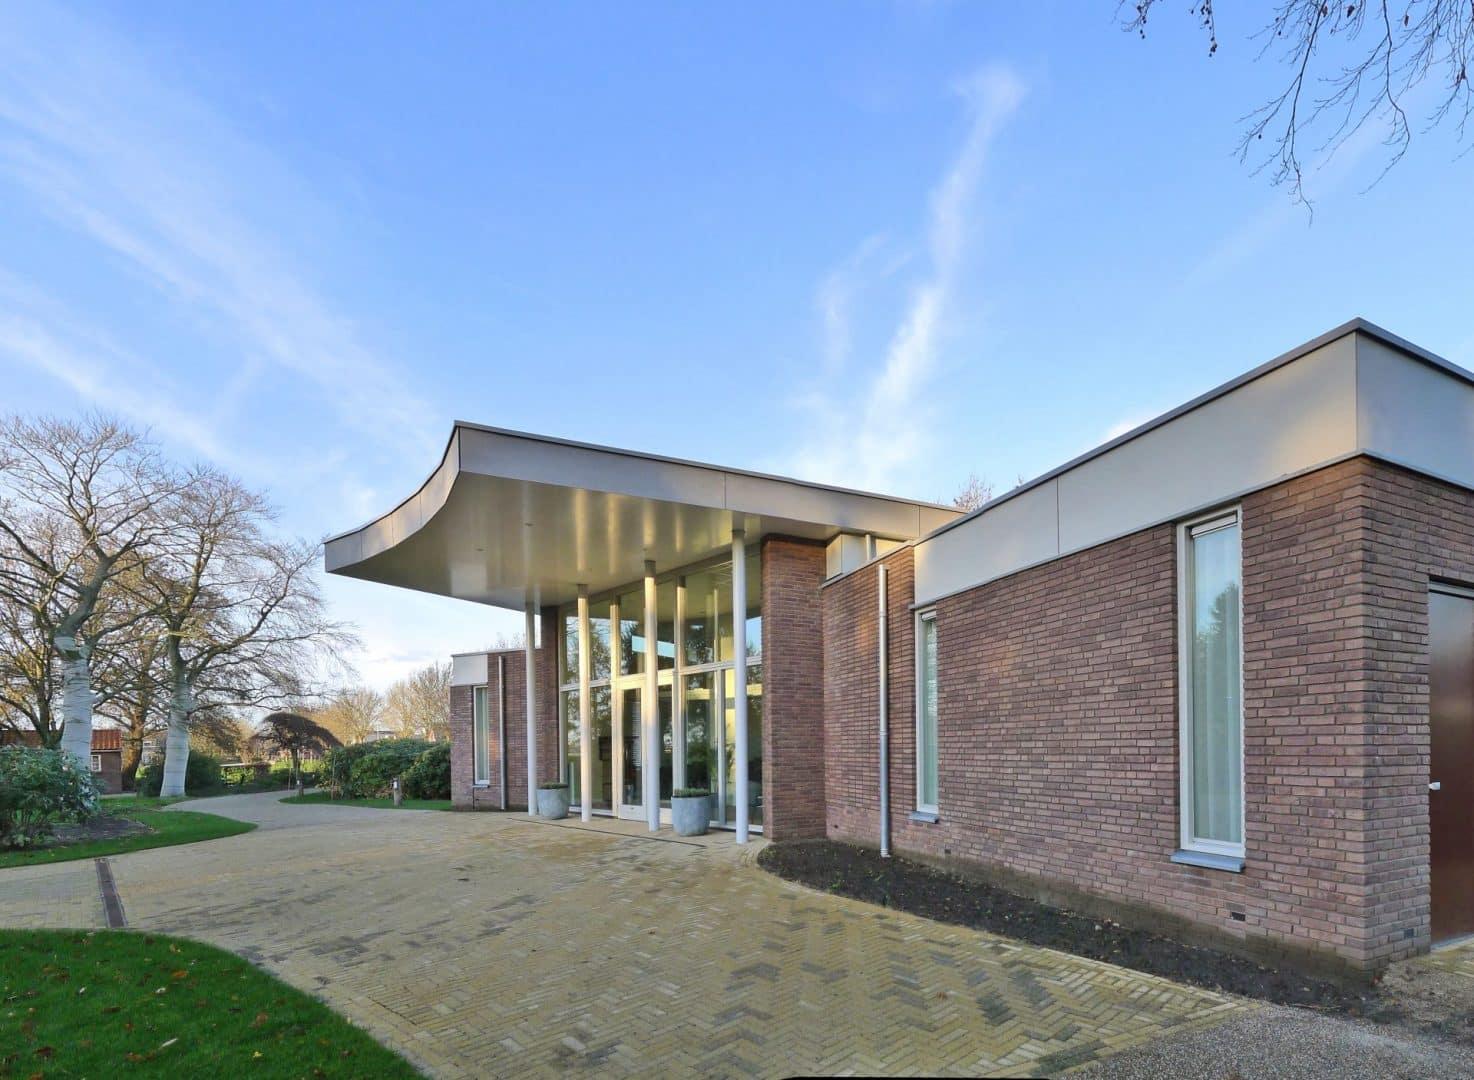 Nieuwe aula begraafplaats Tempel gereed